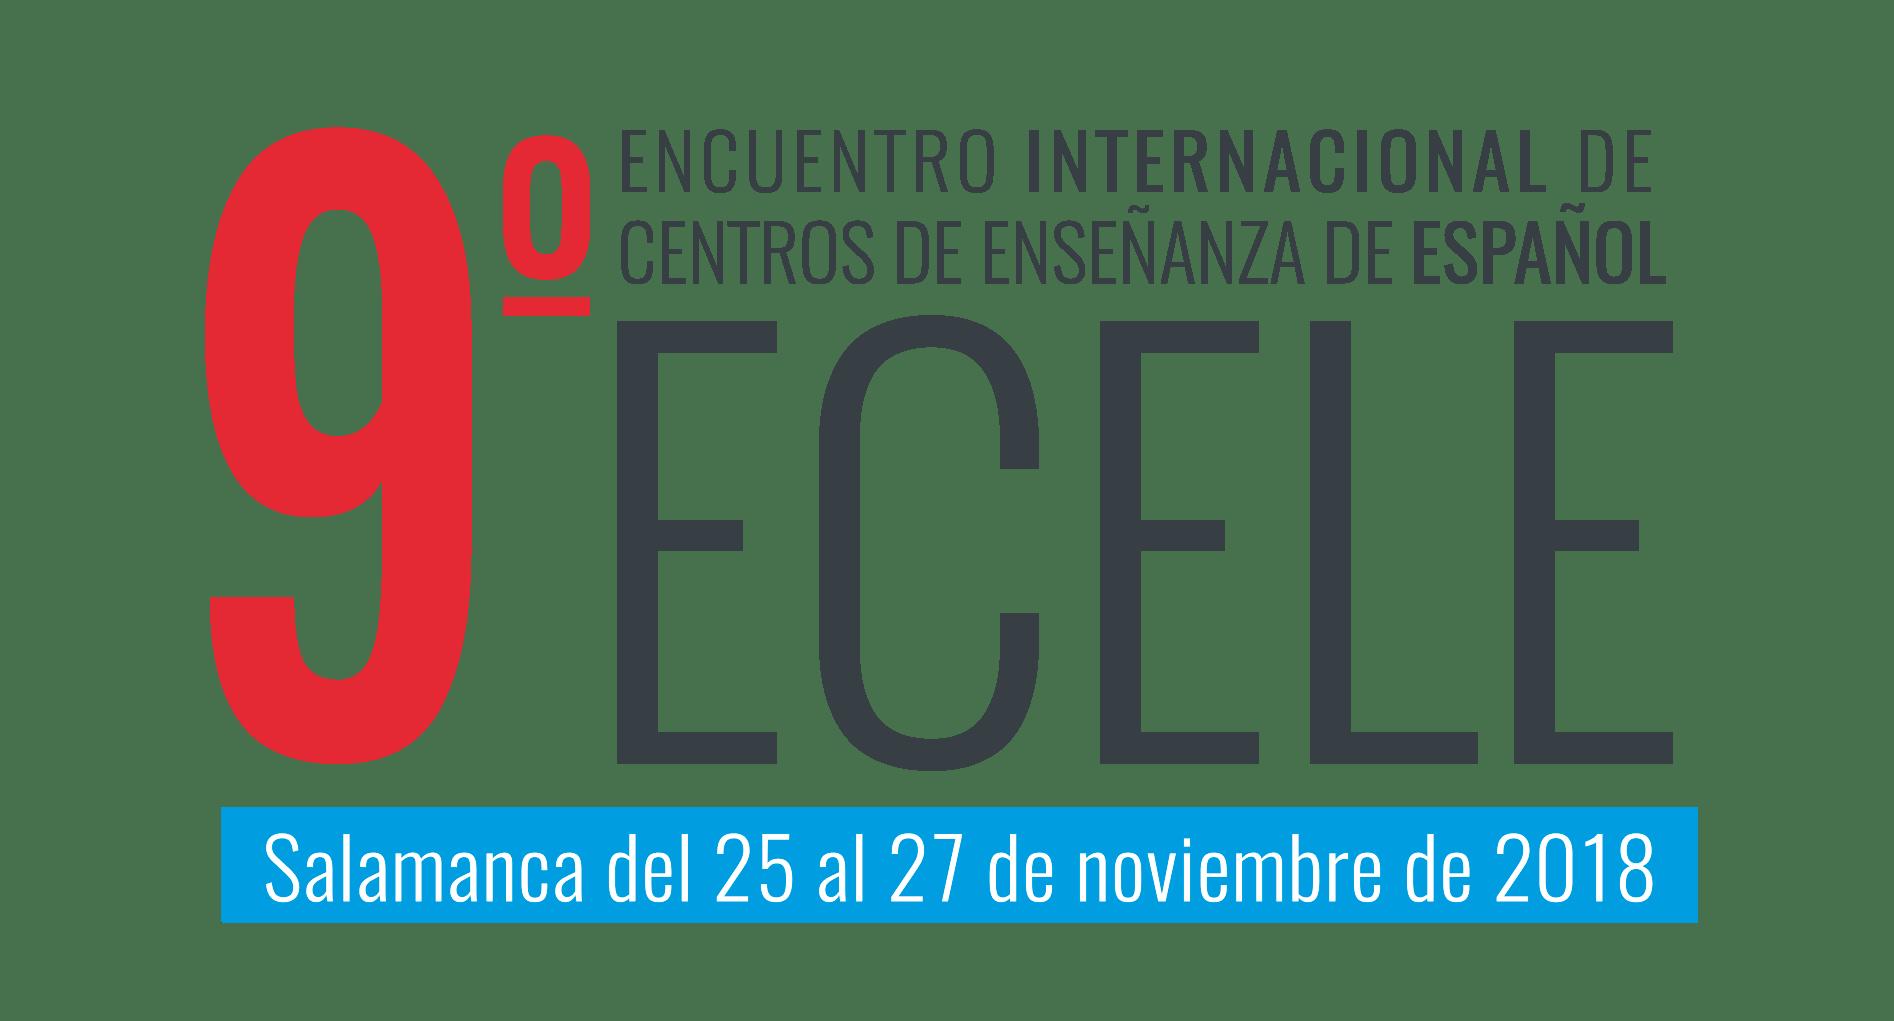 ECELE 2018 to be held in Salamanca